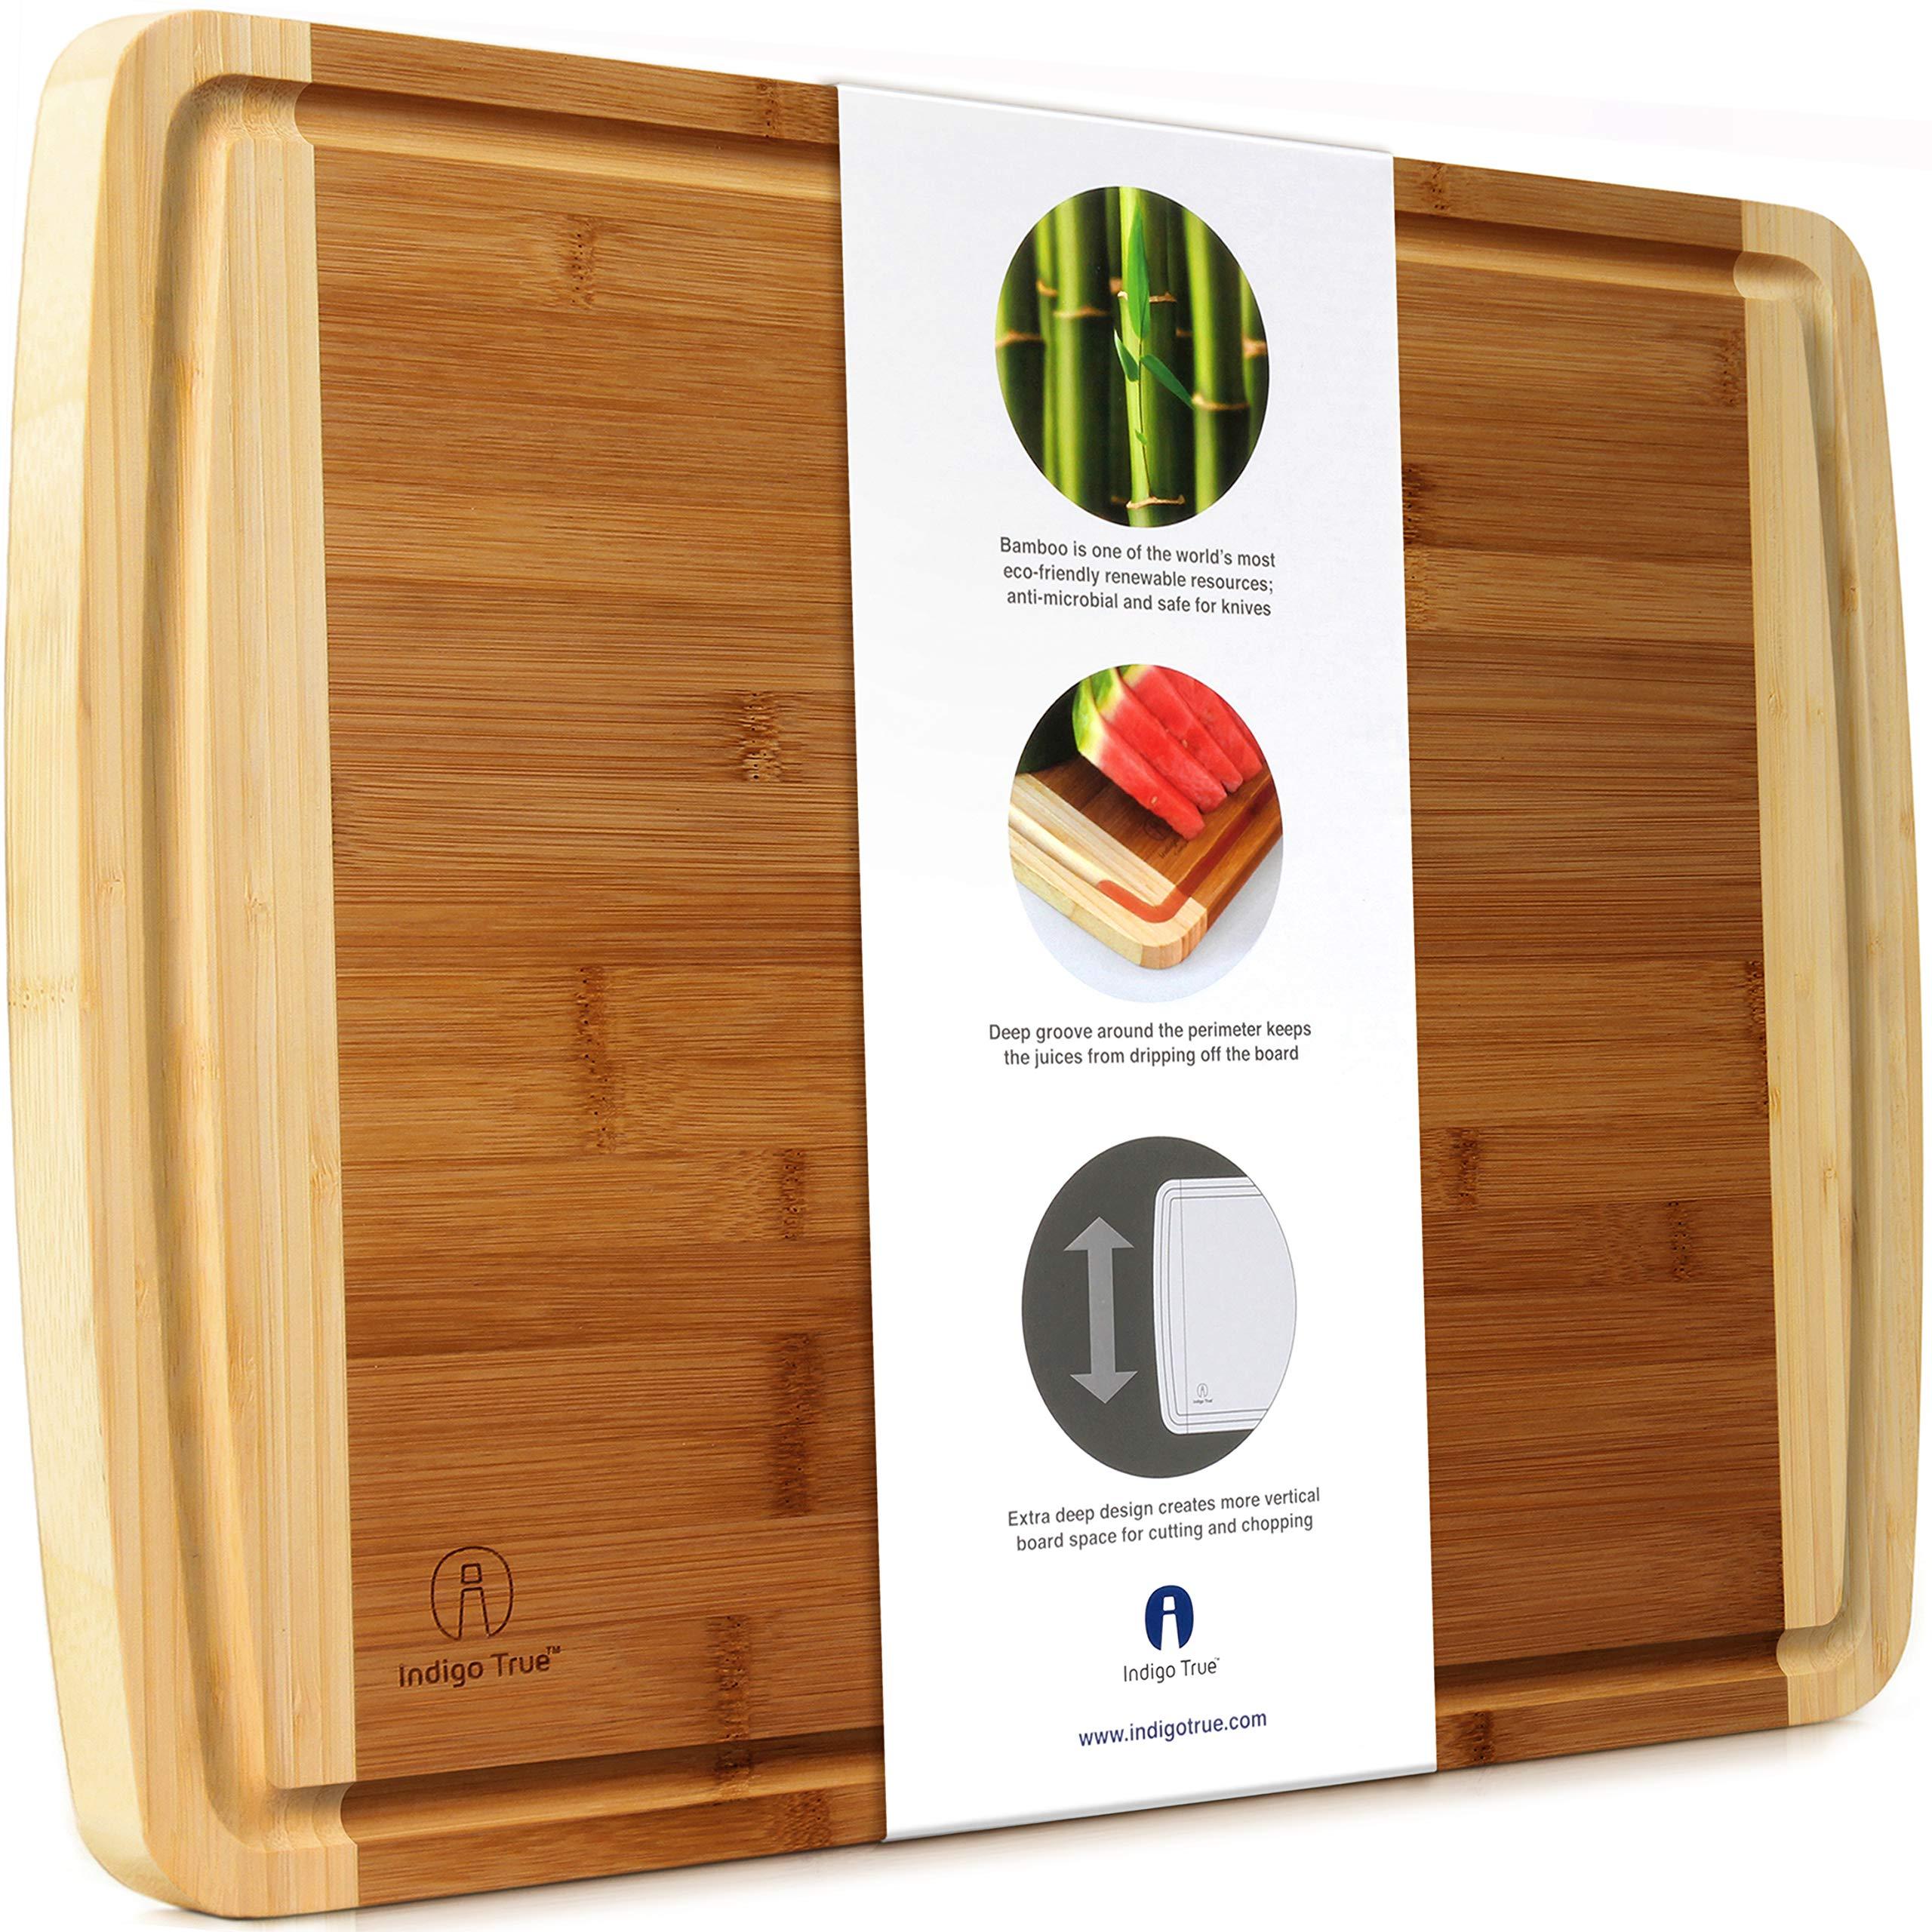 "Indigo True Extra Large Bamboo Cutting Board with Deep Juice Groove 17.5"" x 13.5"" x 0.75''"